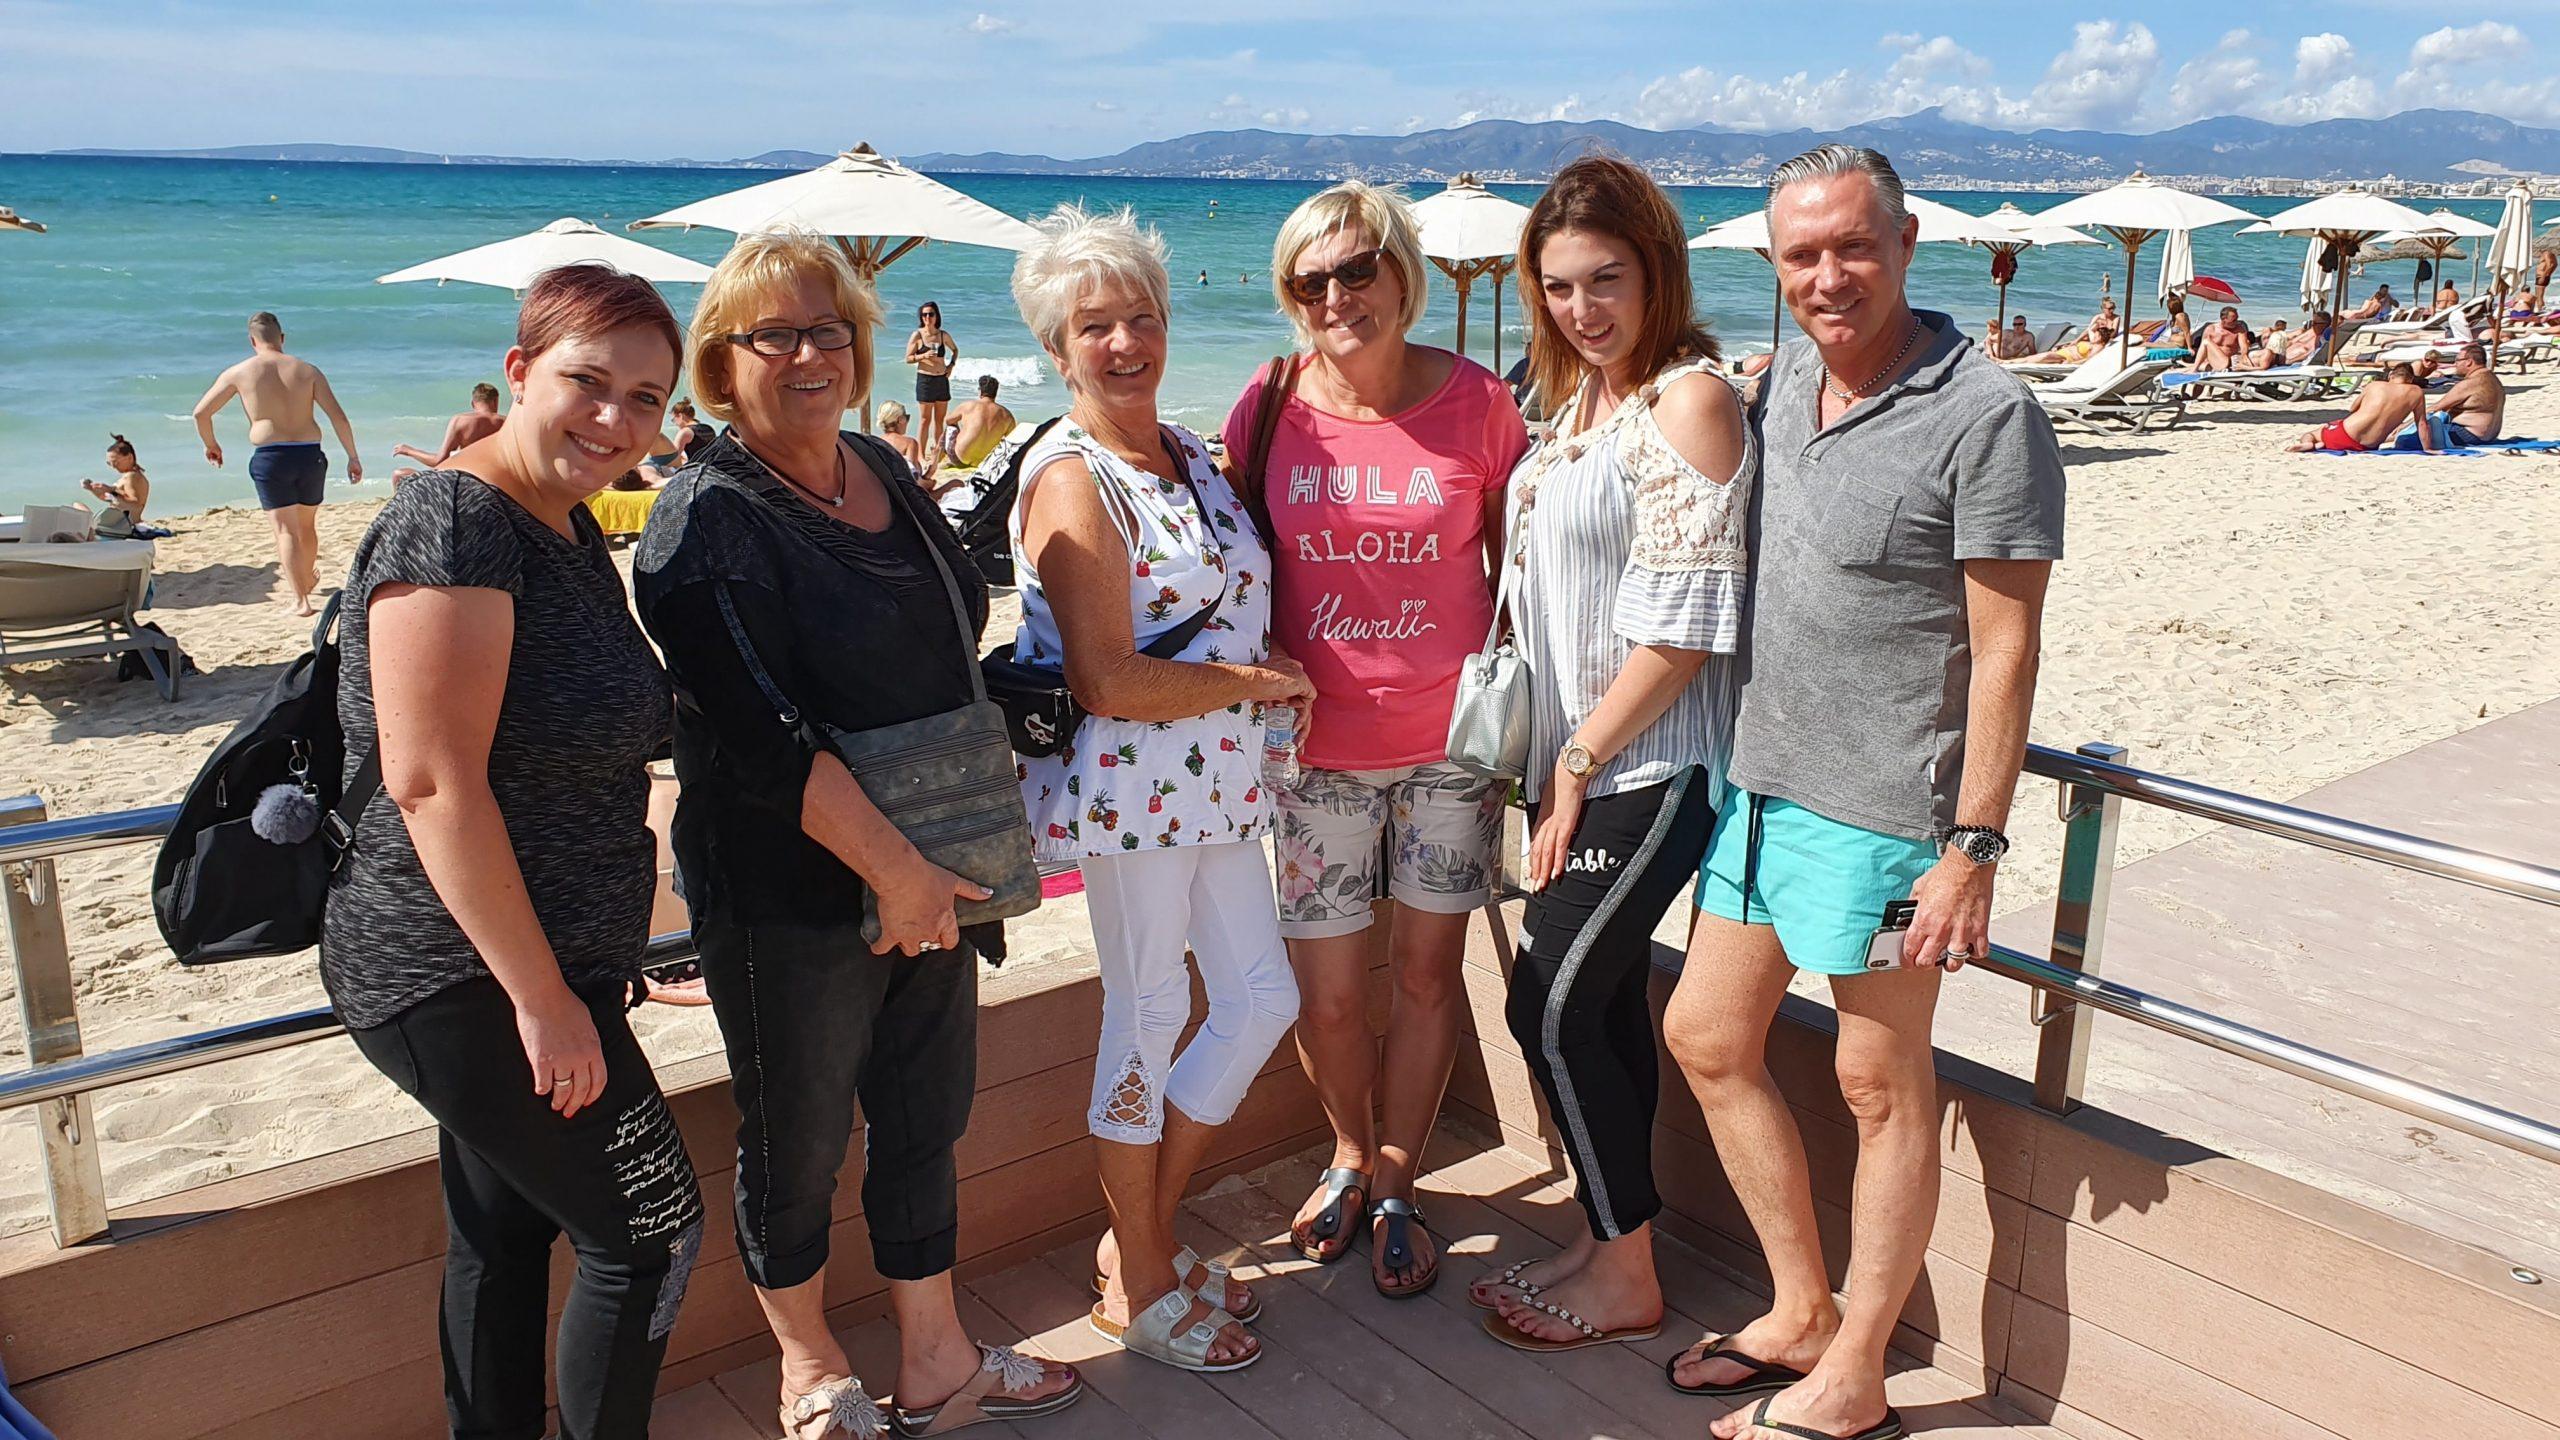 Betriebsausflug 2019 - Mallorca am Strand